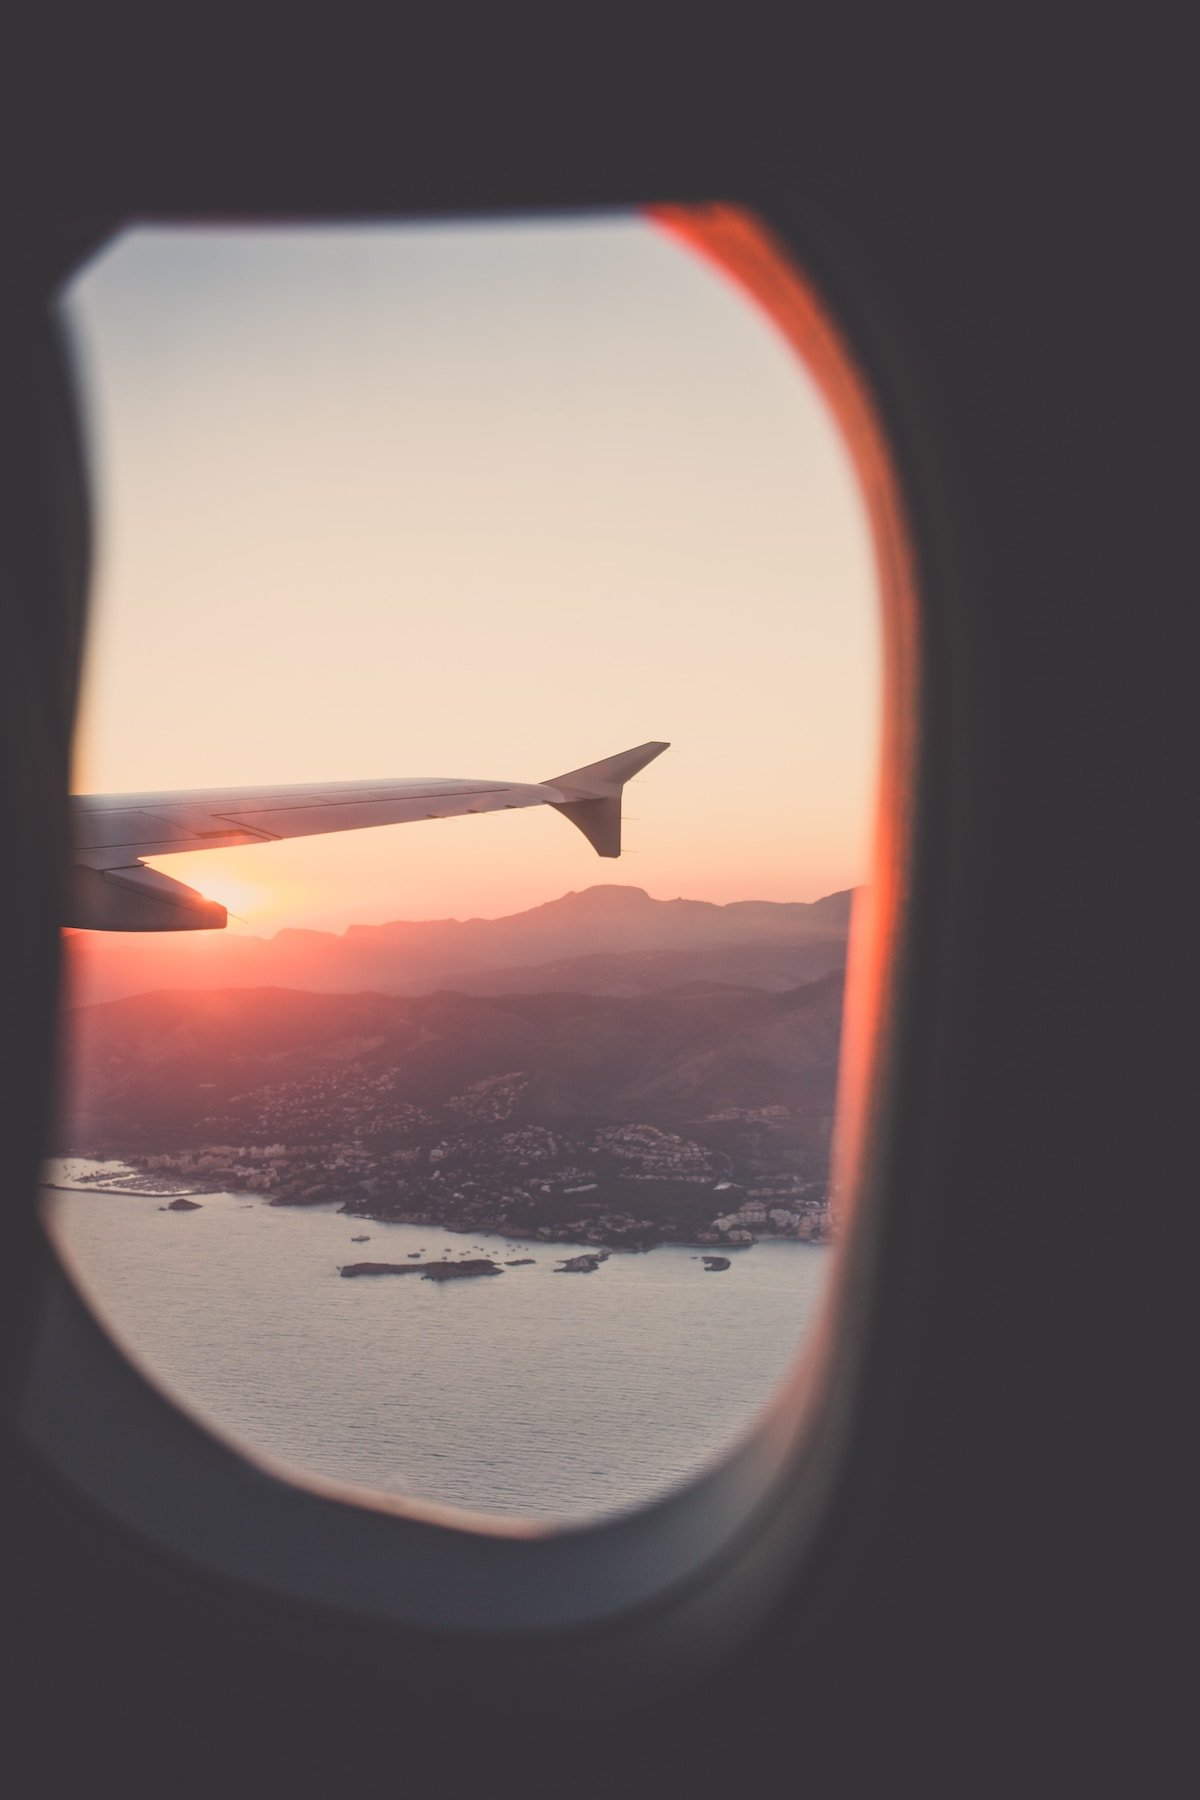 astuces voyage avion mer océan bleu paysage estival blog déco